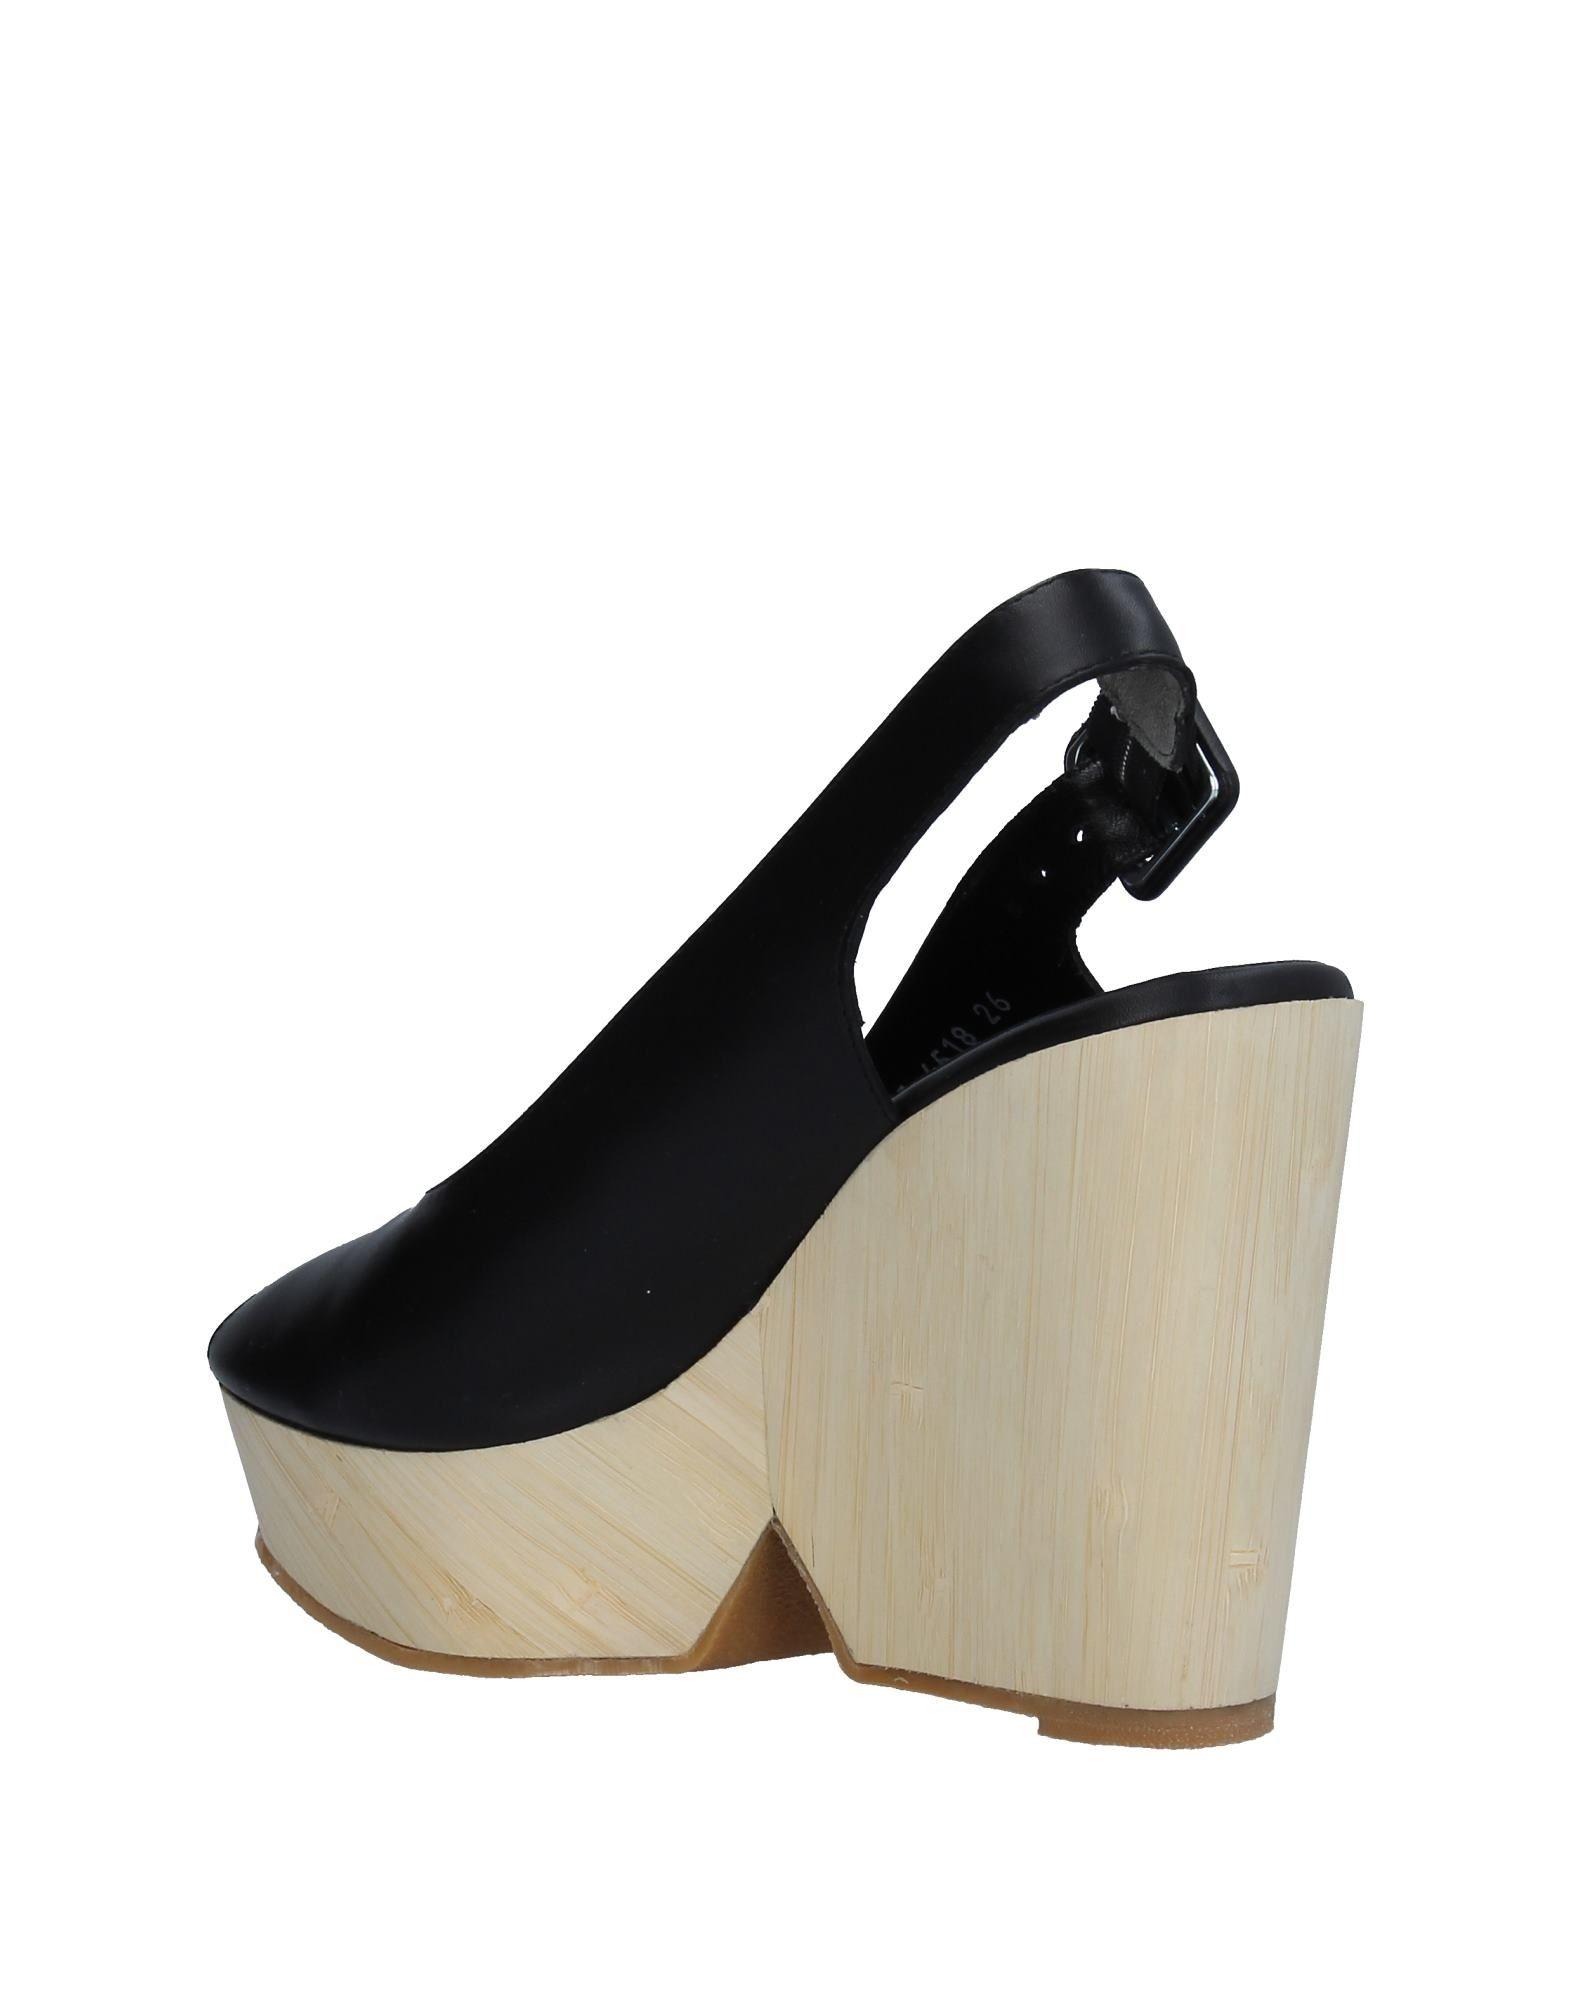 Stilvolle billige Schuhe Sandalen Robert Clergerie Sandalen Schuhe Damen  11337699TI 16f78b